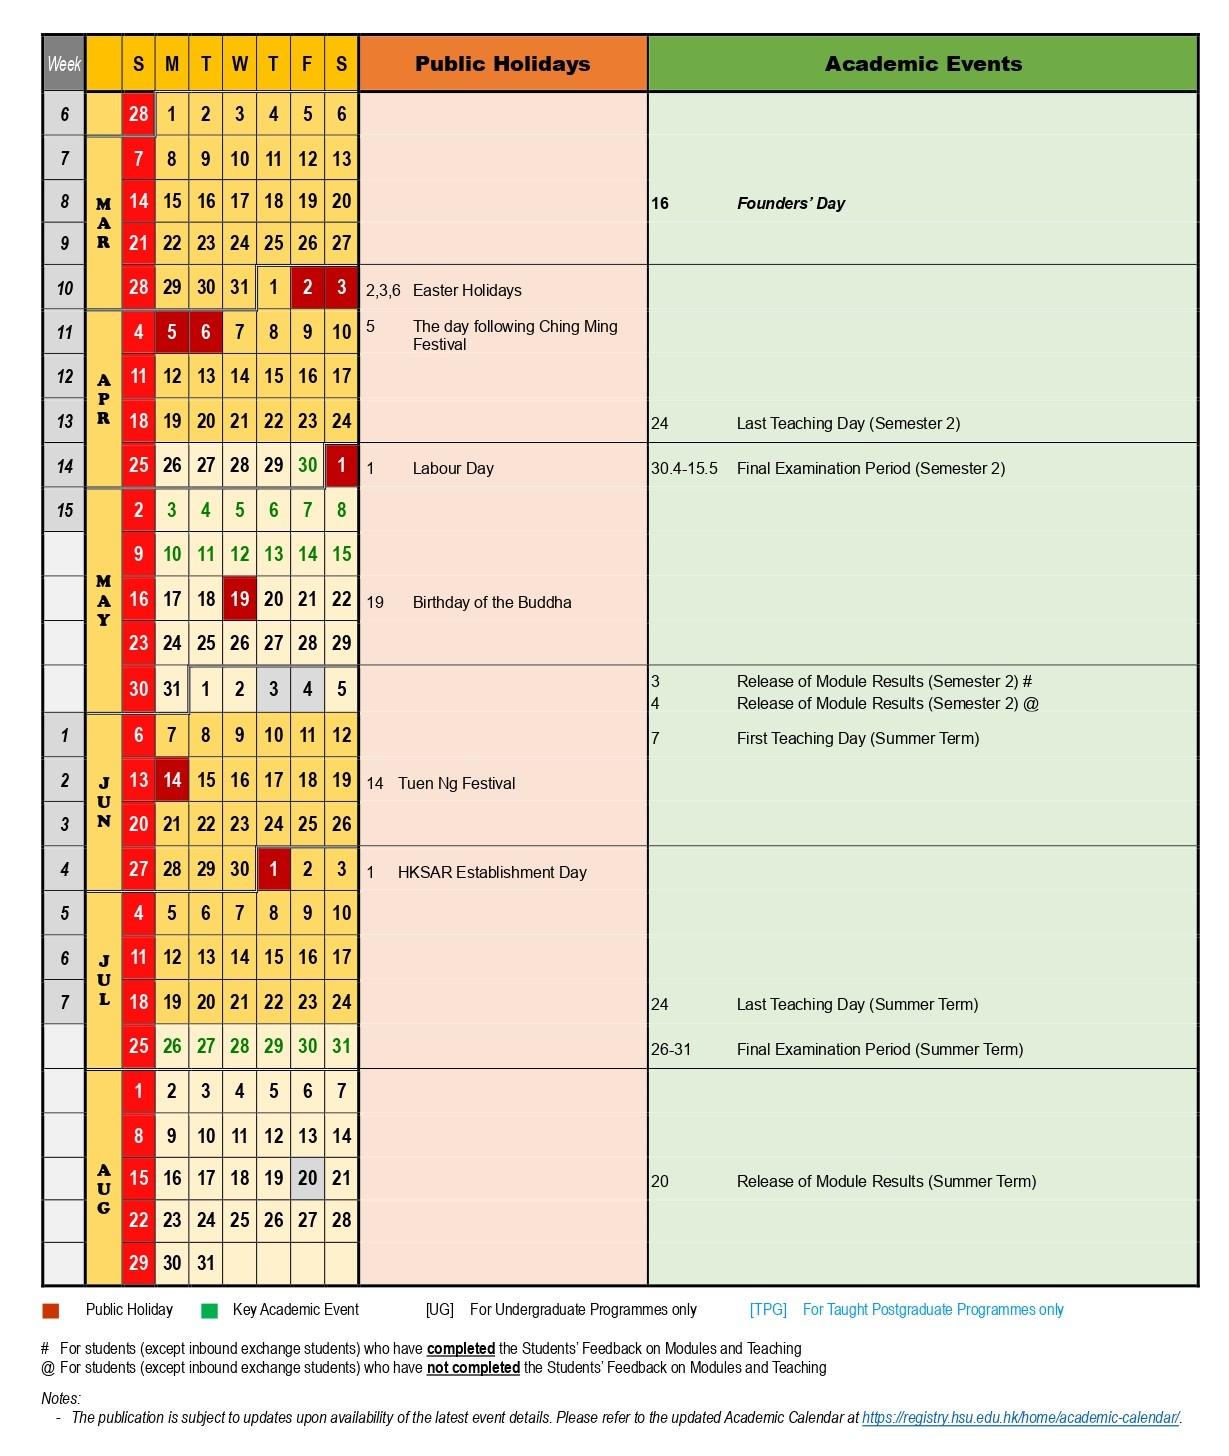 Academic Calendar 2020-21 (11 Sept) 20201214_page-0002